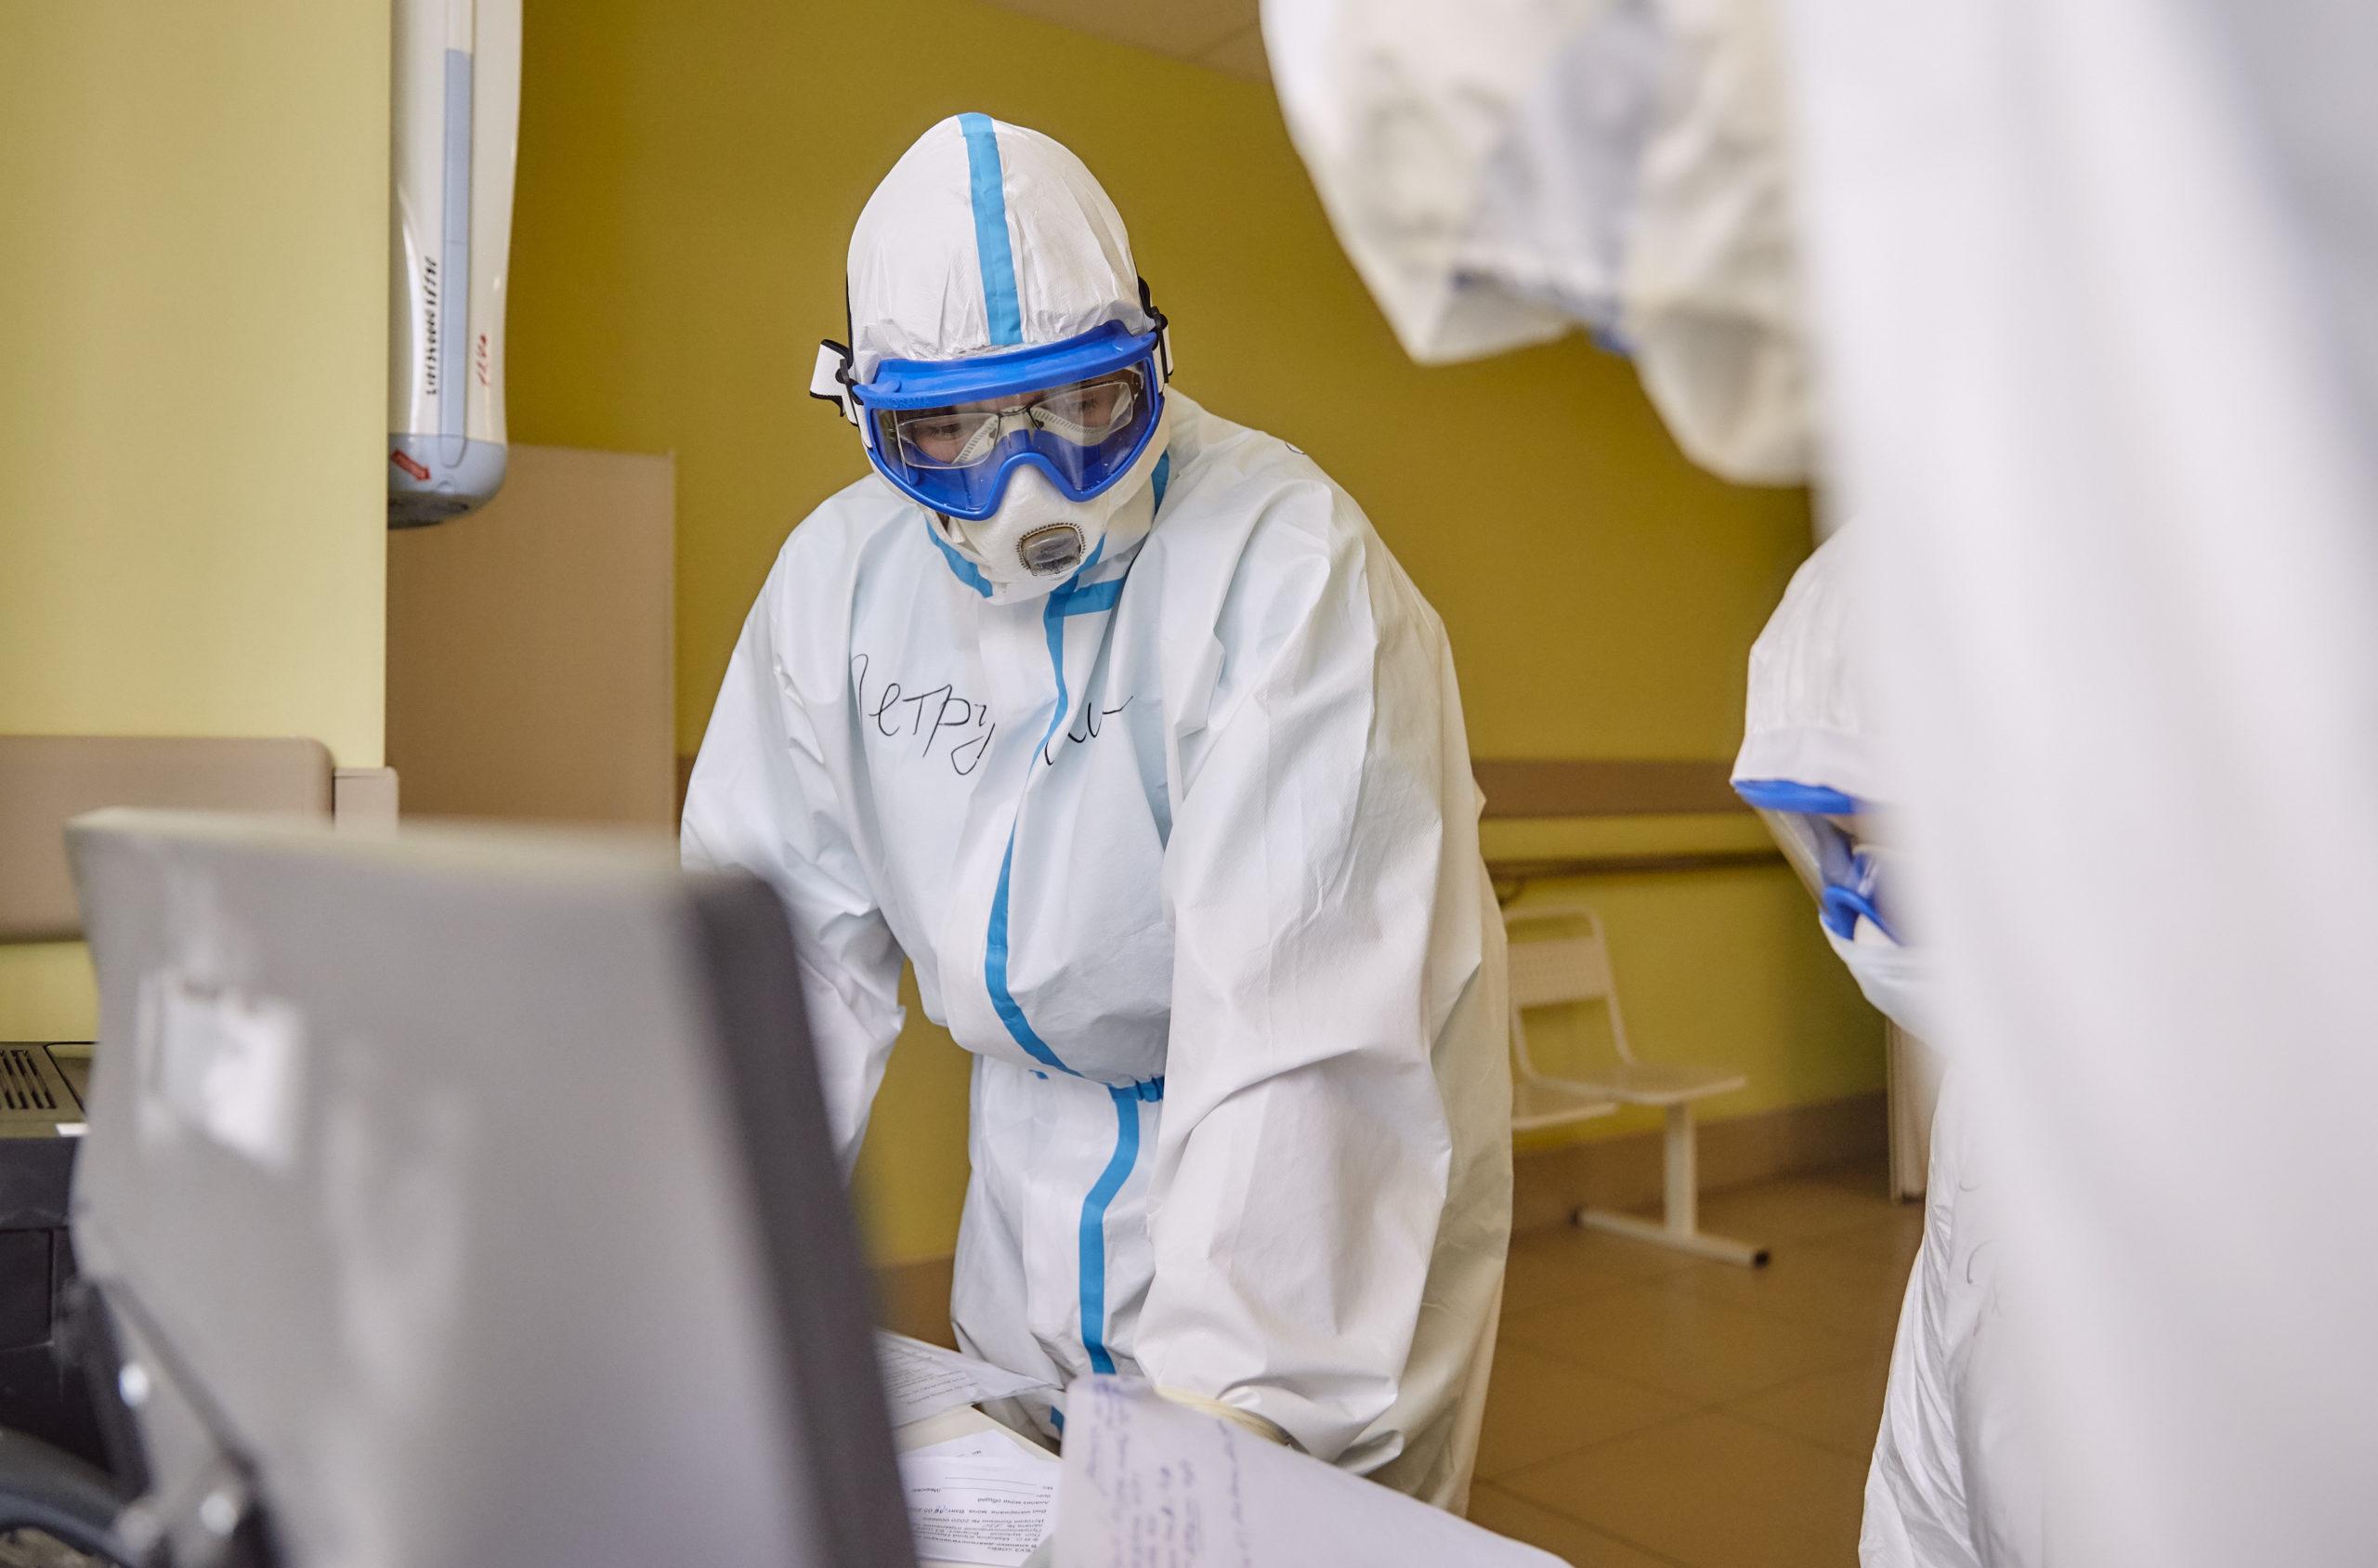 Статистика распространения коронавируса в Тверской области на 31 августа